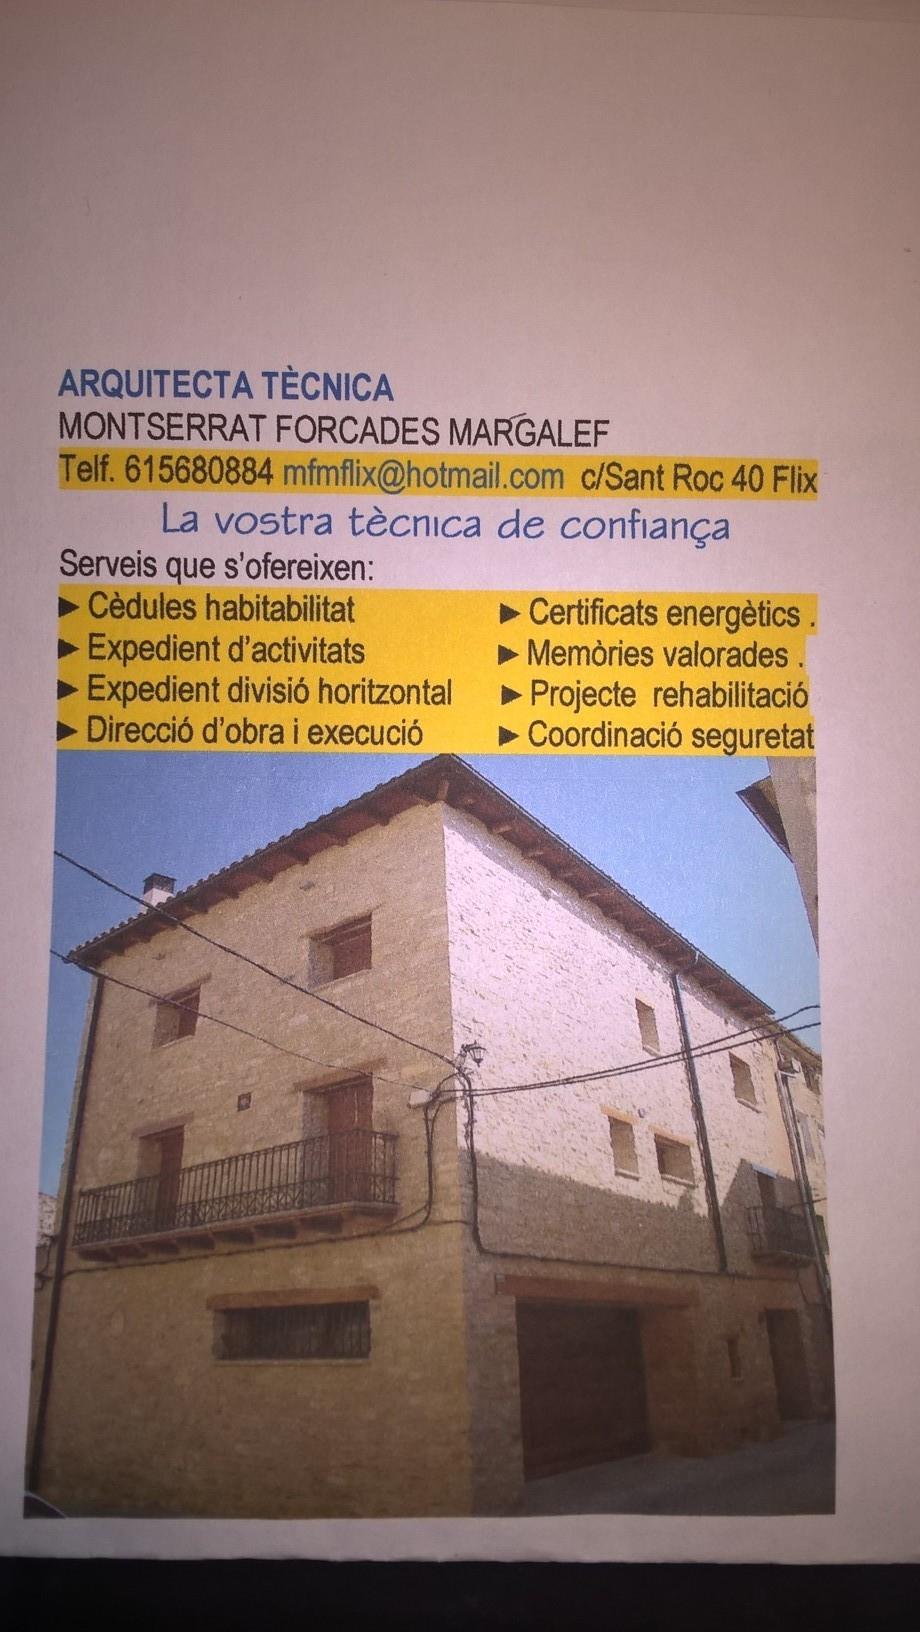 Montserrat Forcades Margalef